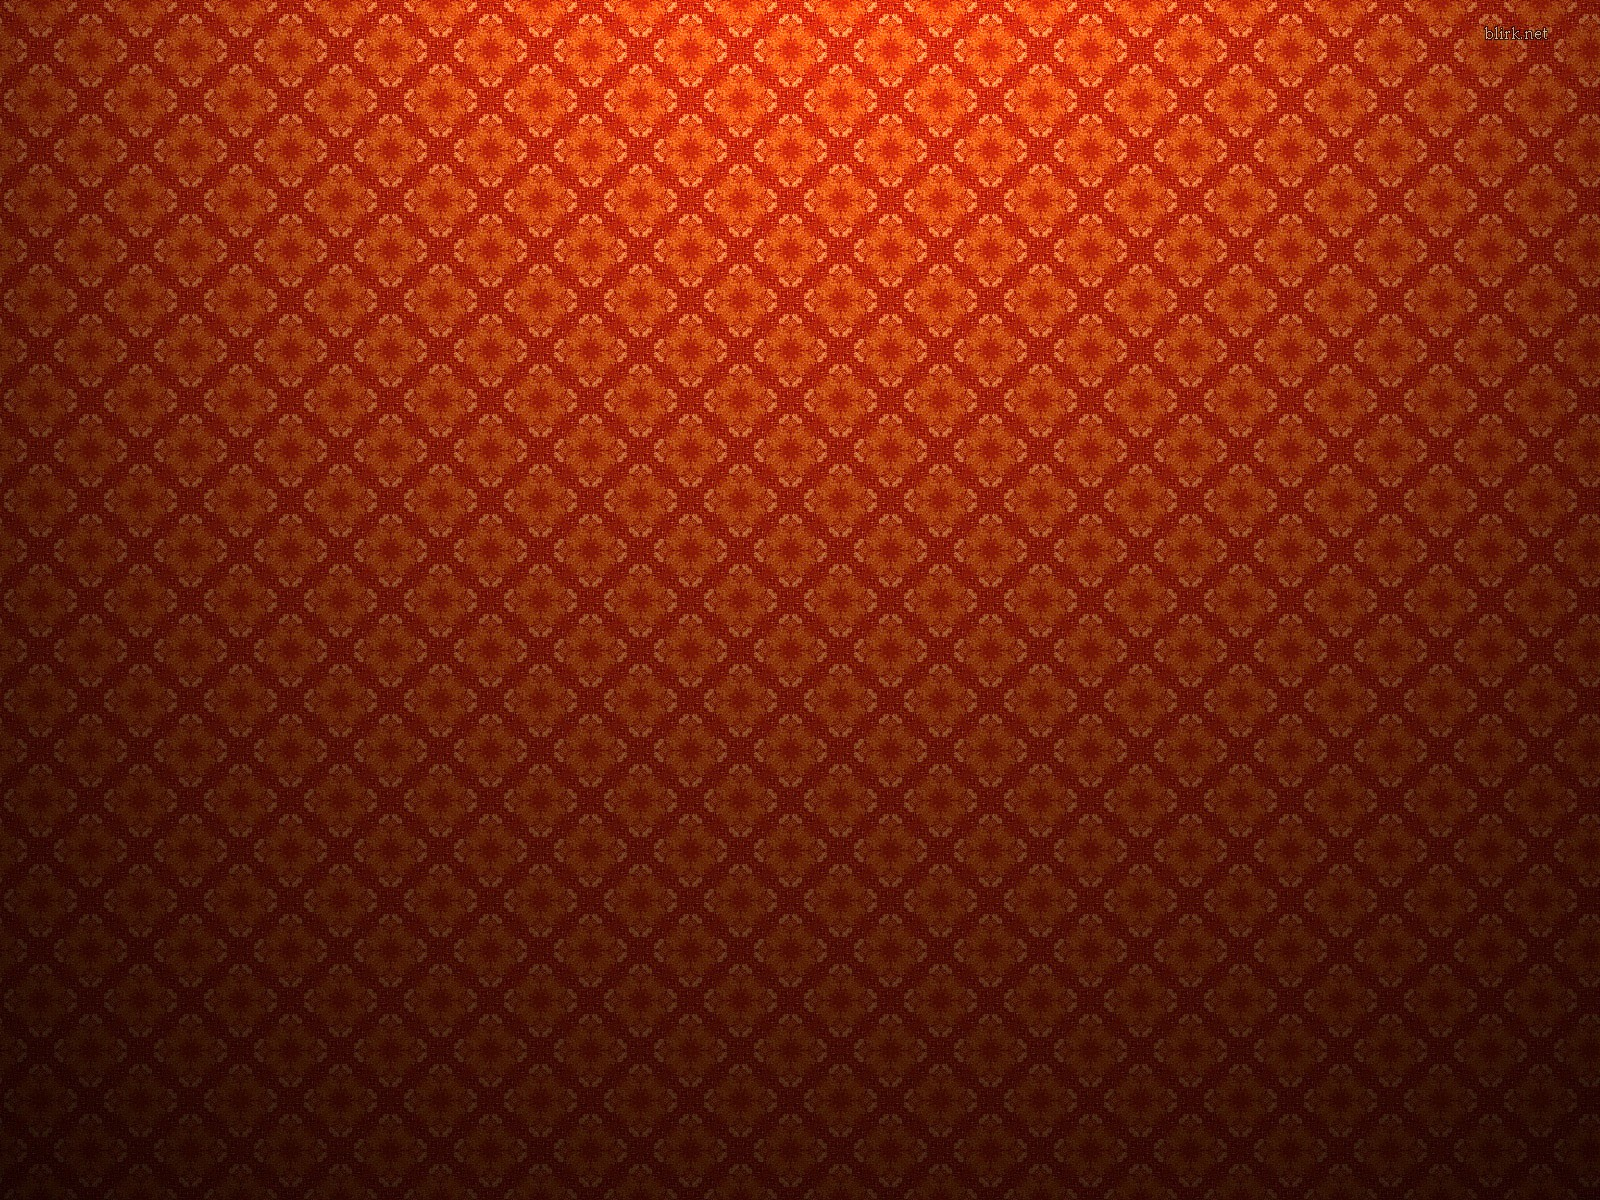 Wallpaper textures wallpapersafari for Textured wallpaper